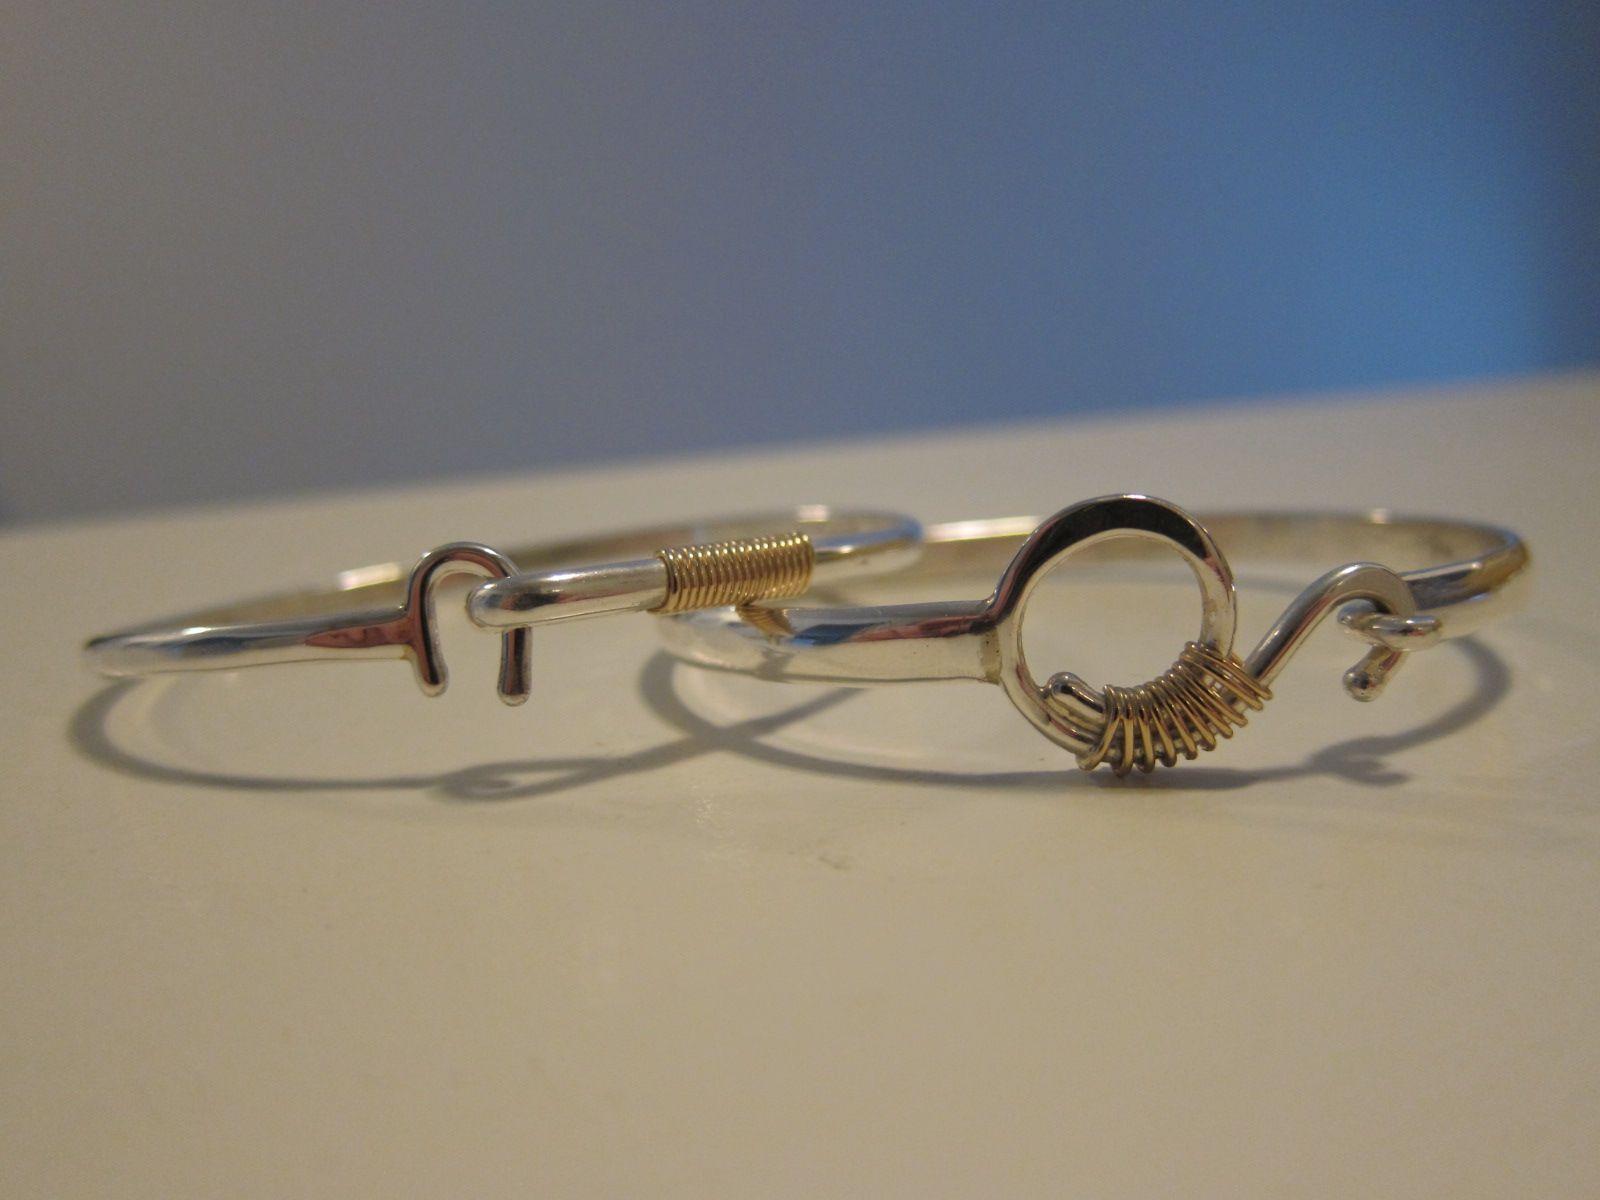 sterling silver bracelets from sonya ltd st croix the